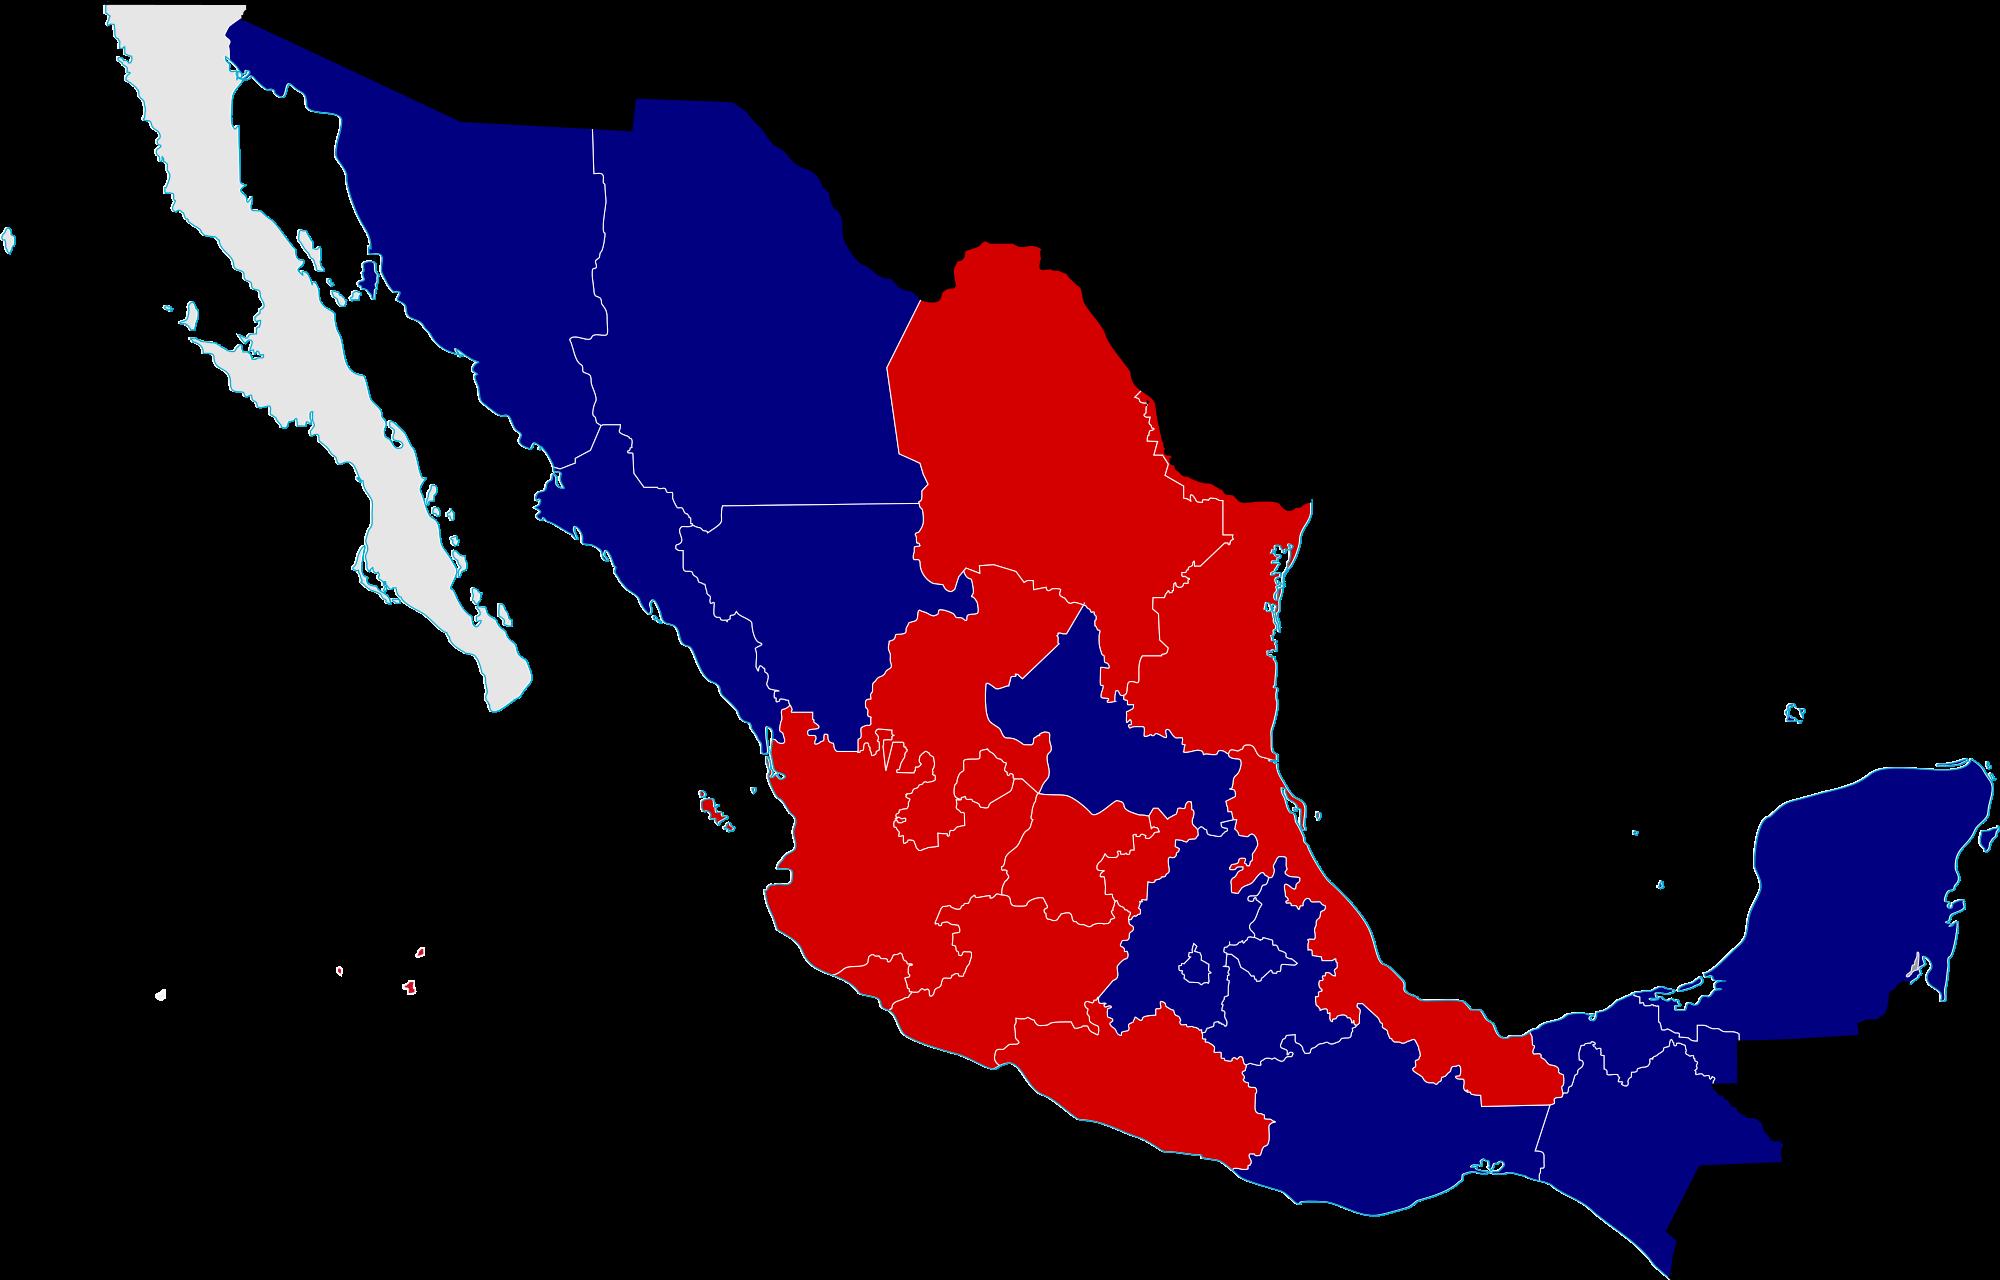 Mexico clipart map. File civil war divisions